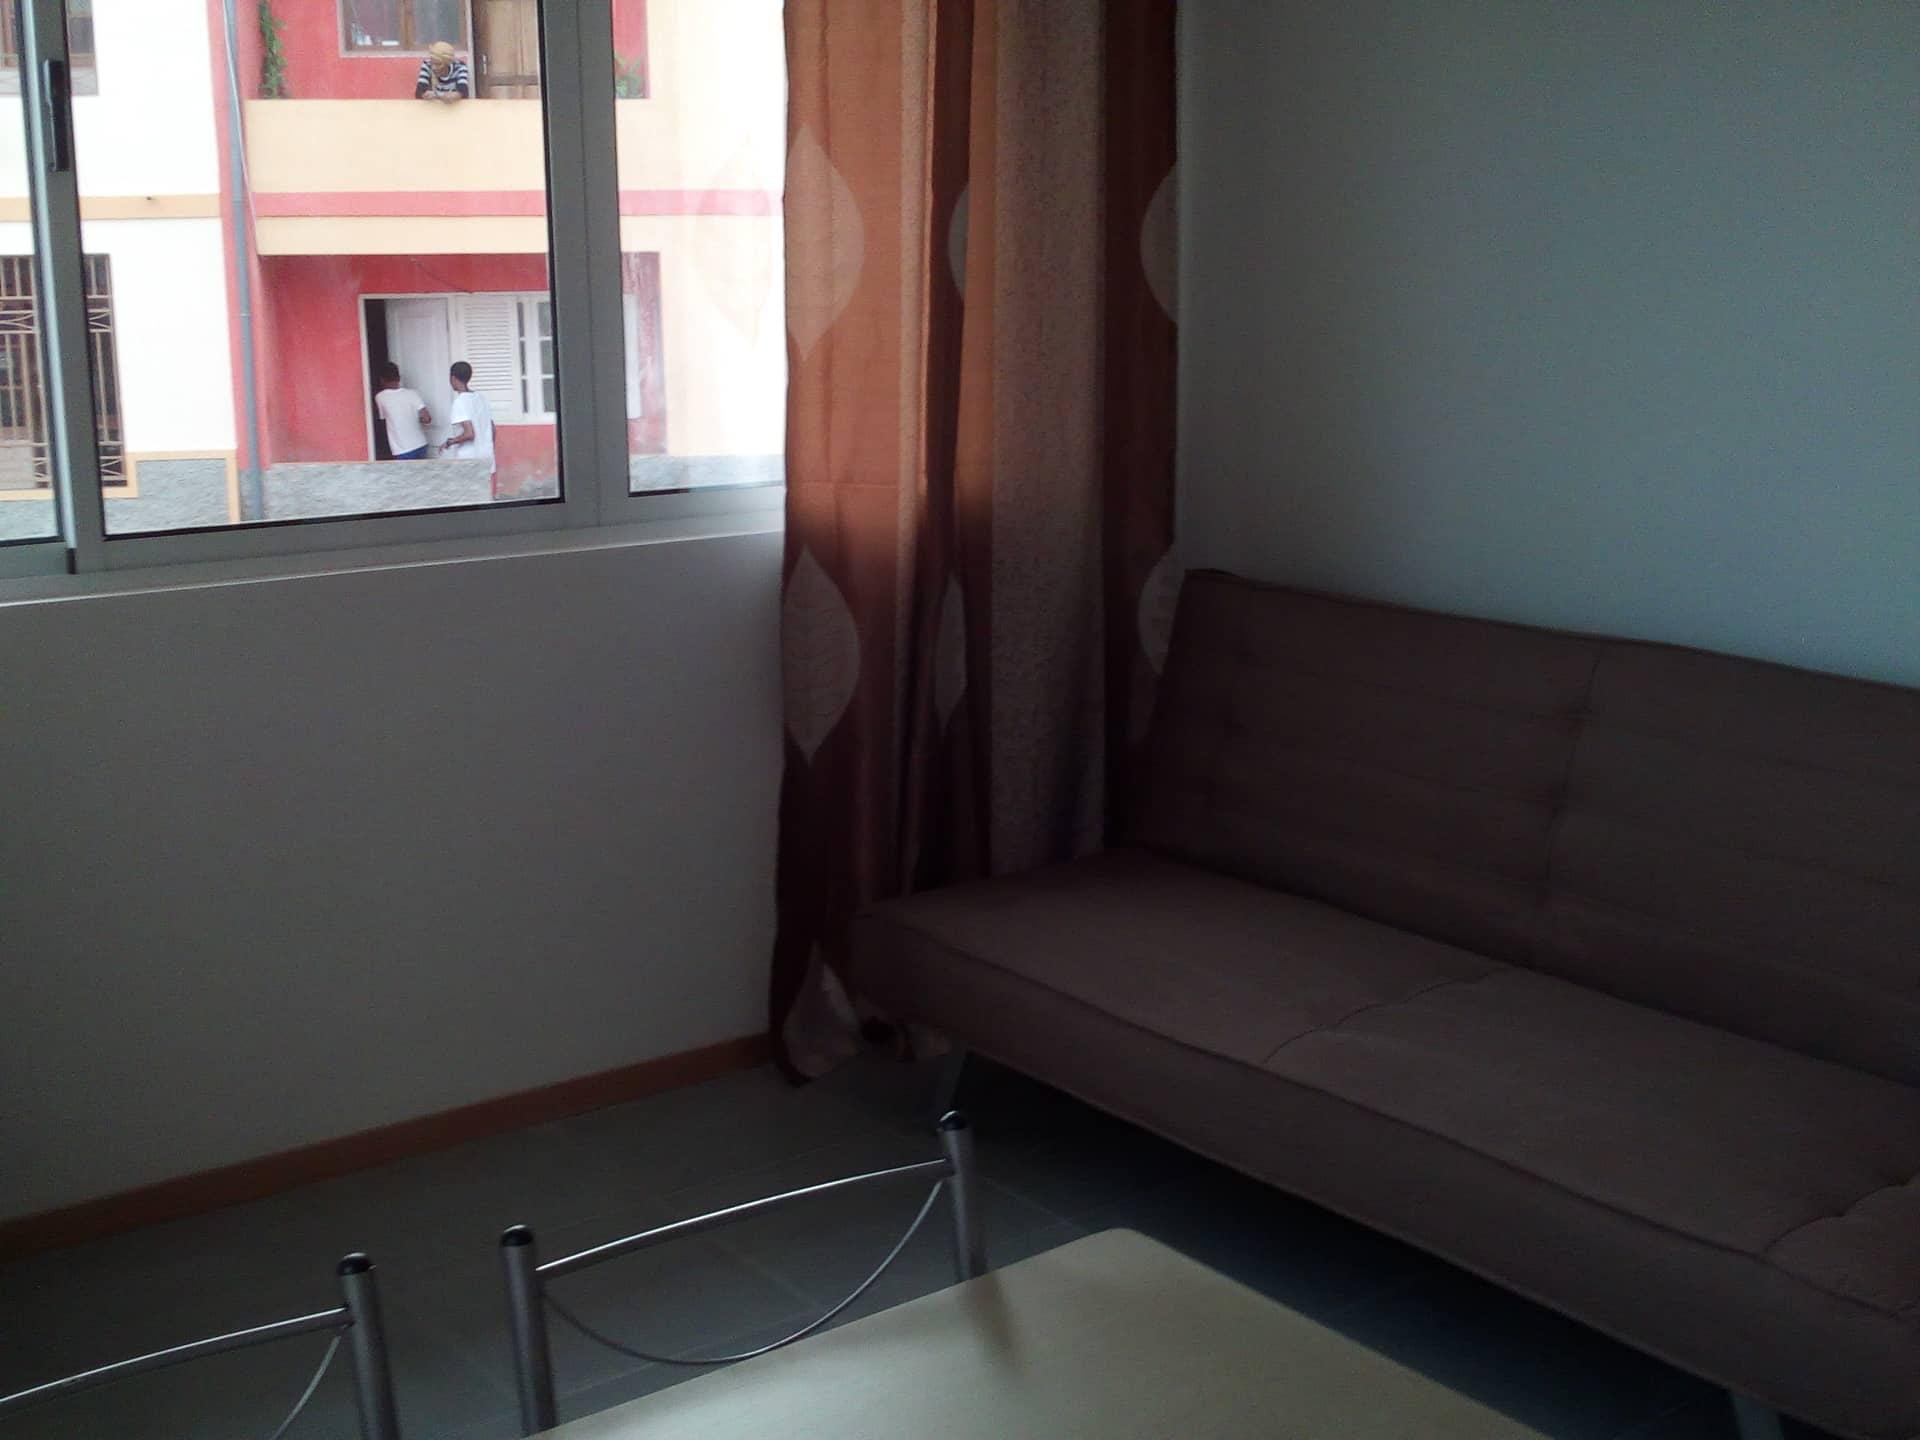 4 sofa and living room window